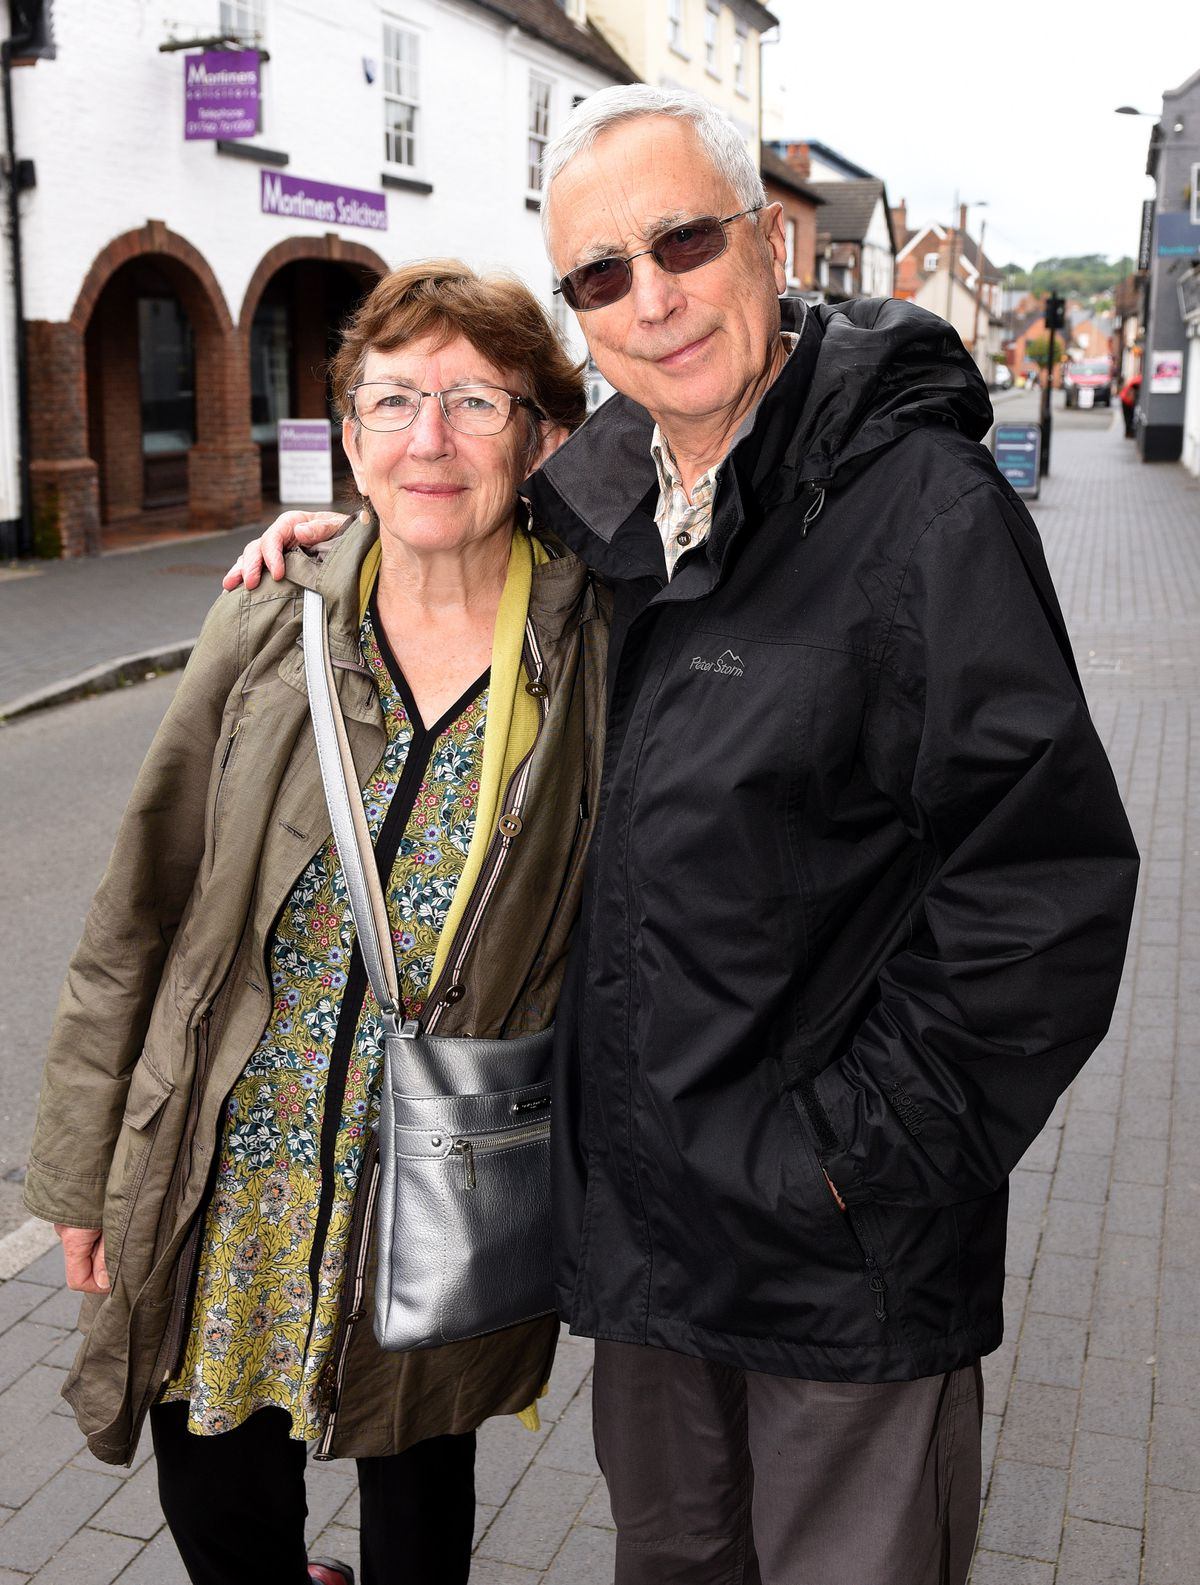 Michael and Kay Ollerenshaw